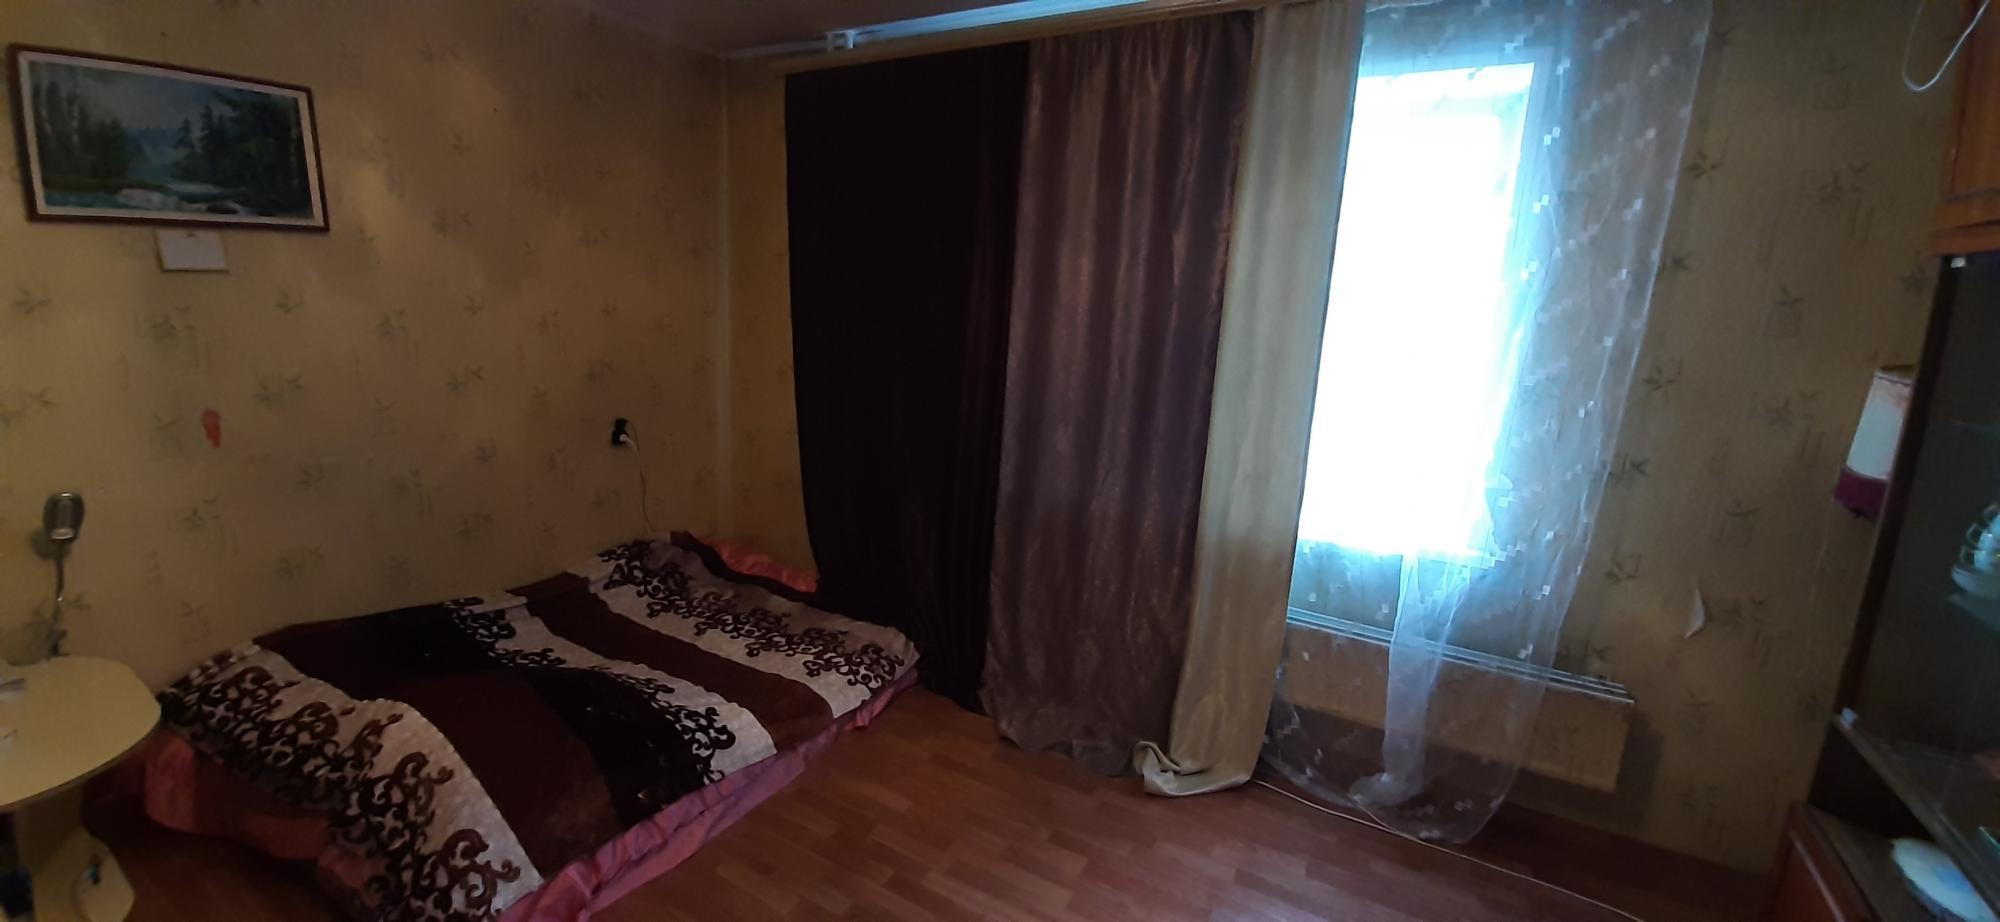 2к квартира улица Воронова, 18 корпус 2 | 15000 | аренда в Красноярске фото 0